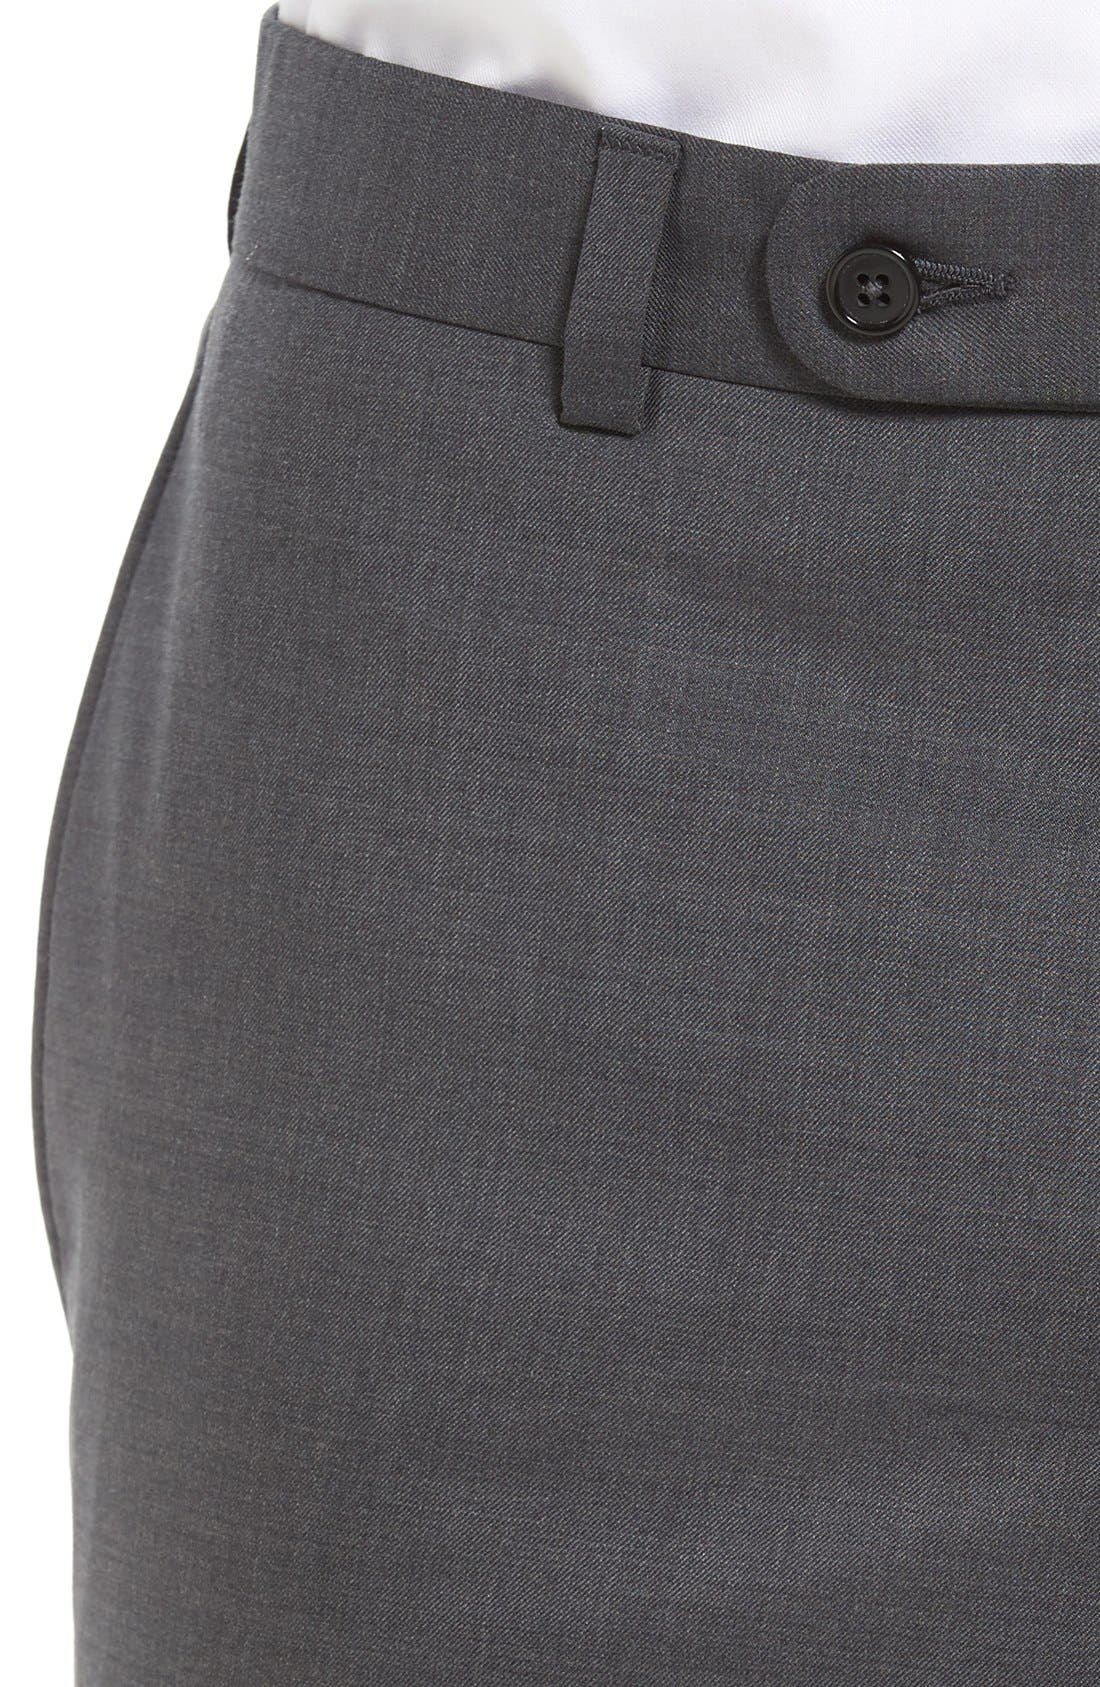 Ryan Regular Fit Wool Trousers,                             Alternate thumbnail 4, color,                             Charcoal